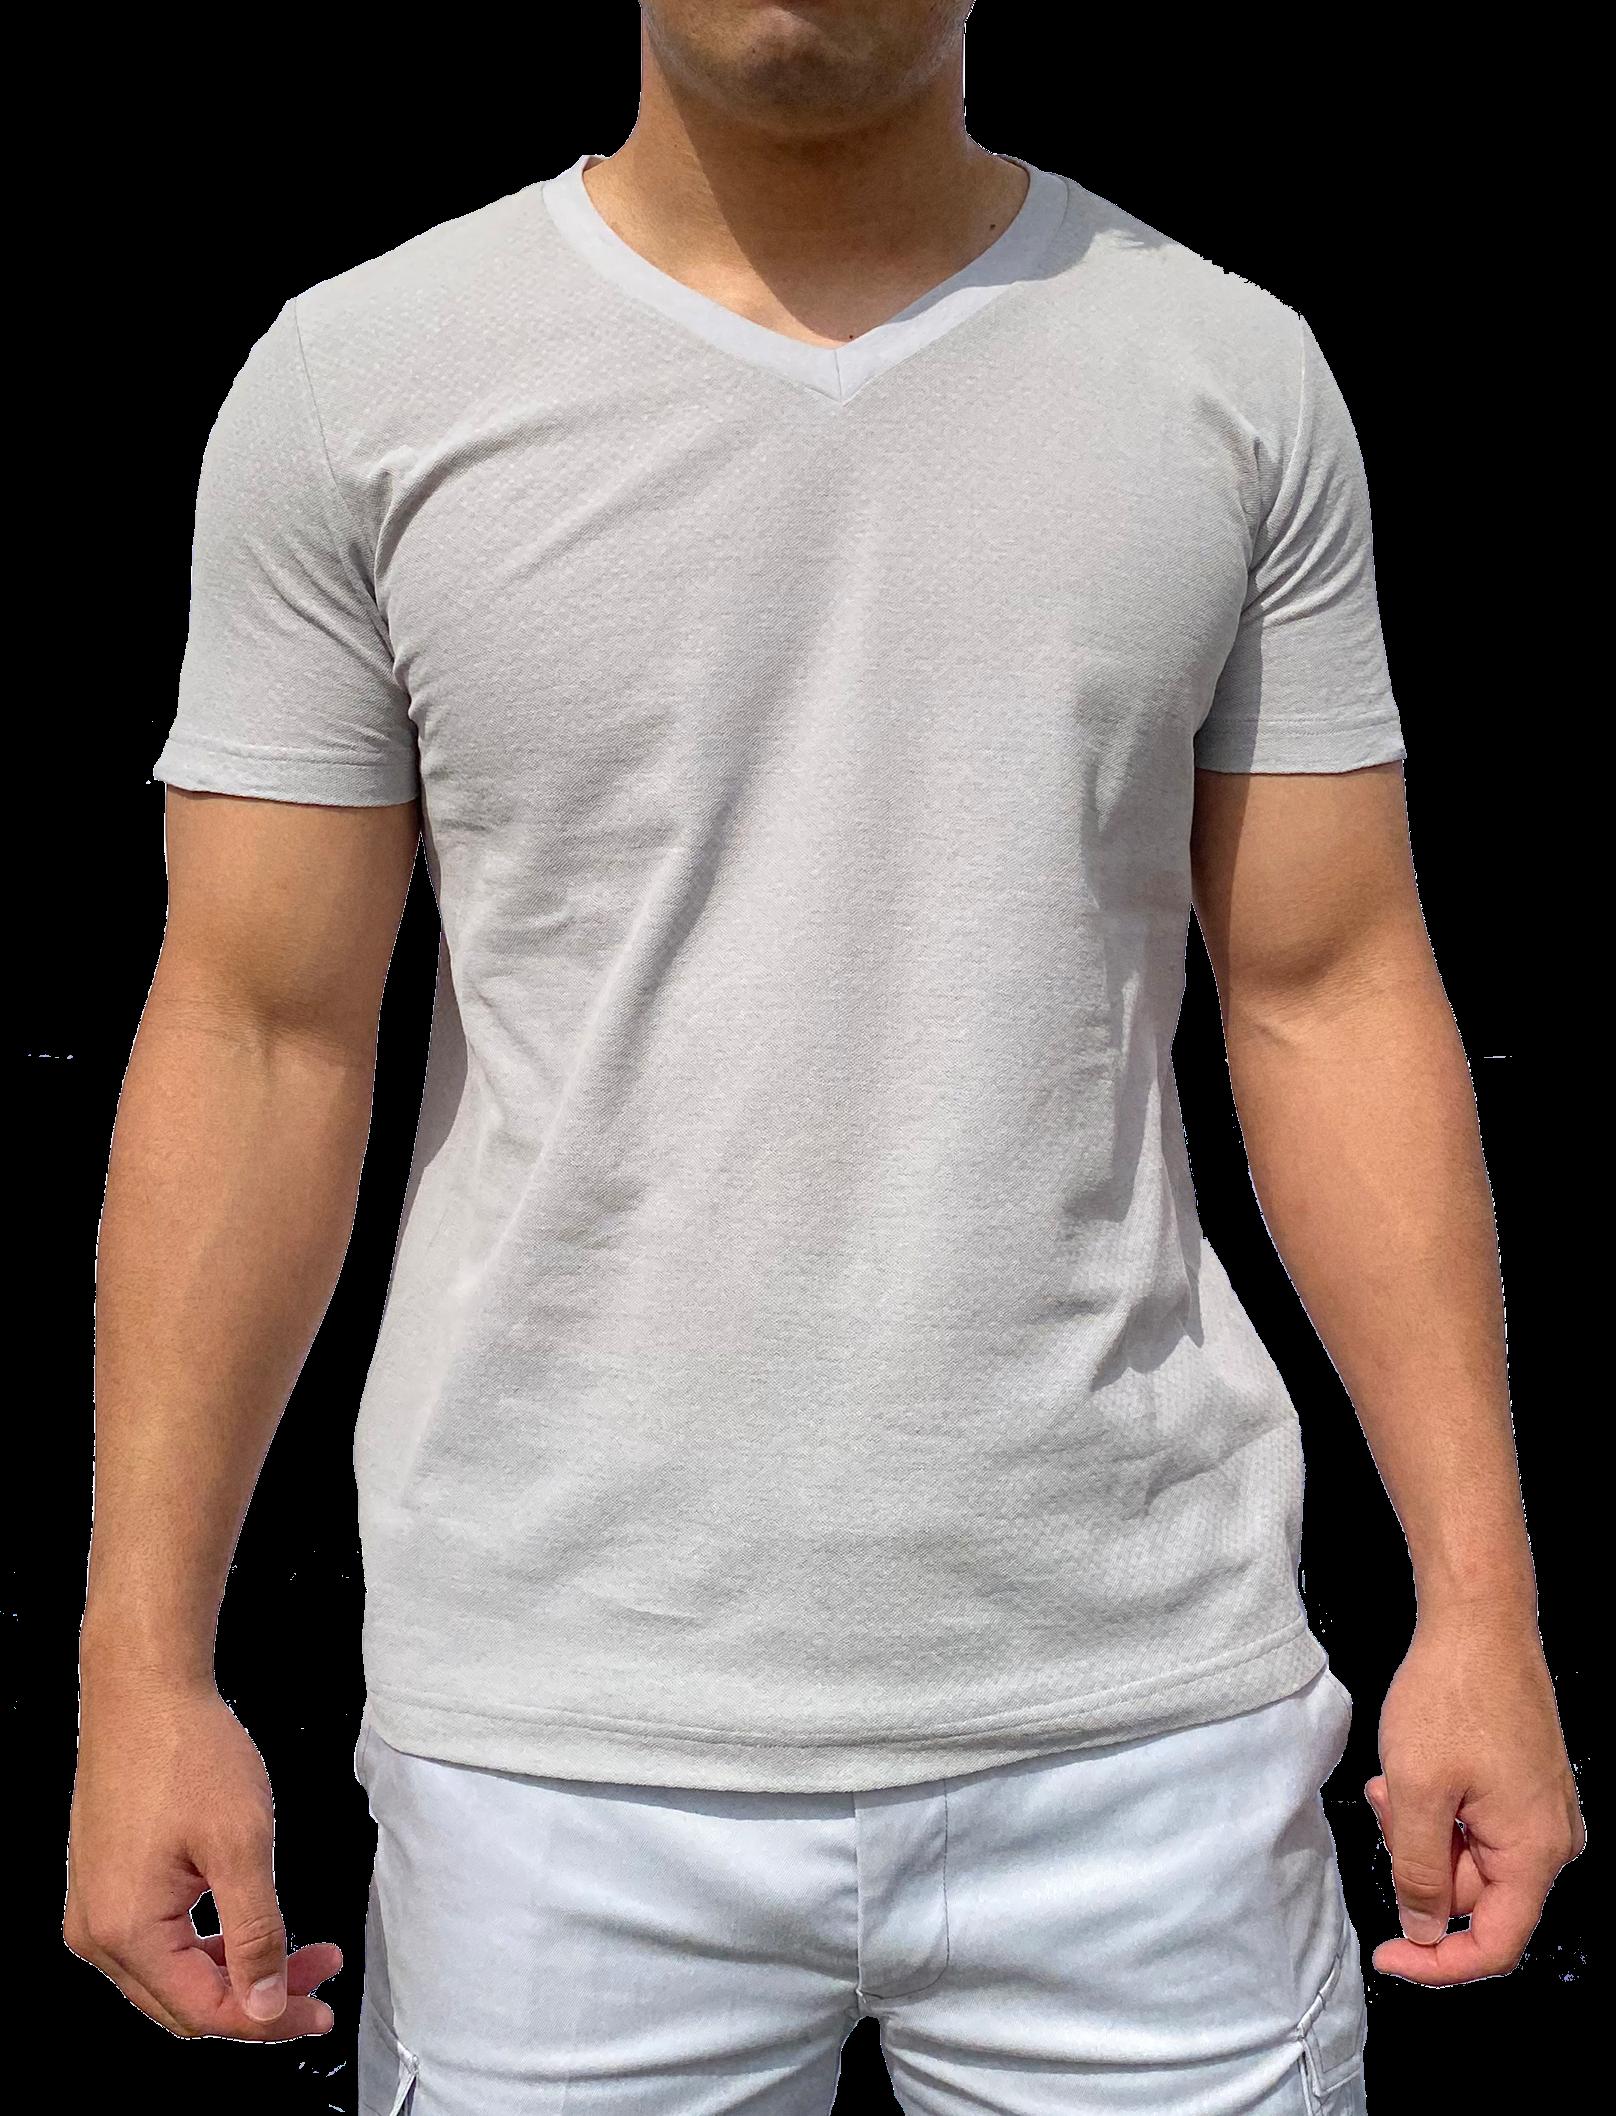 ARGO(アルゴ) 木綿 シャツ COOL <V首・半袖> ~遮熱・放熱機能性アンダーウェア~